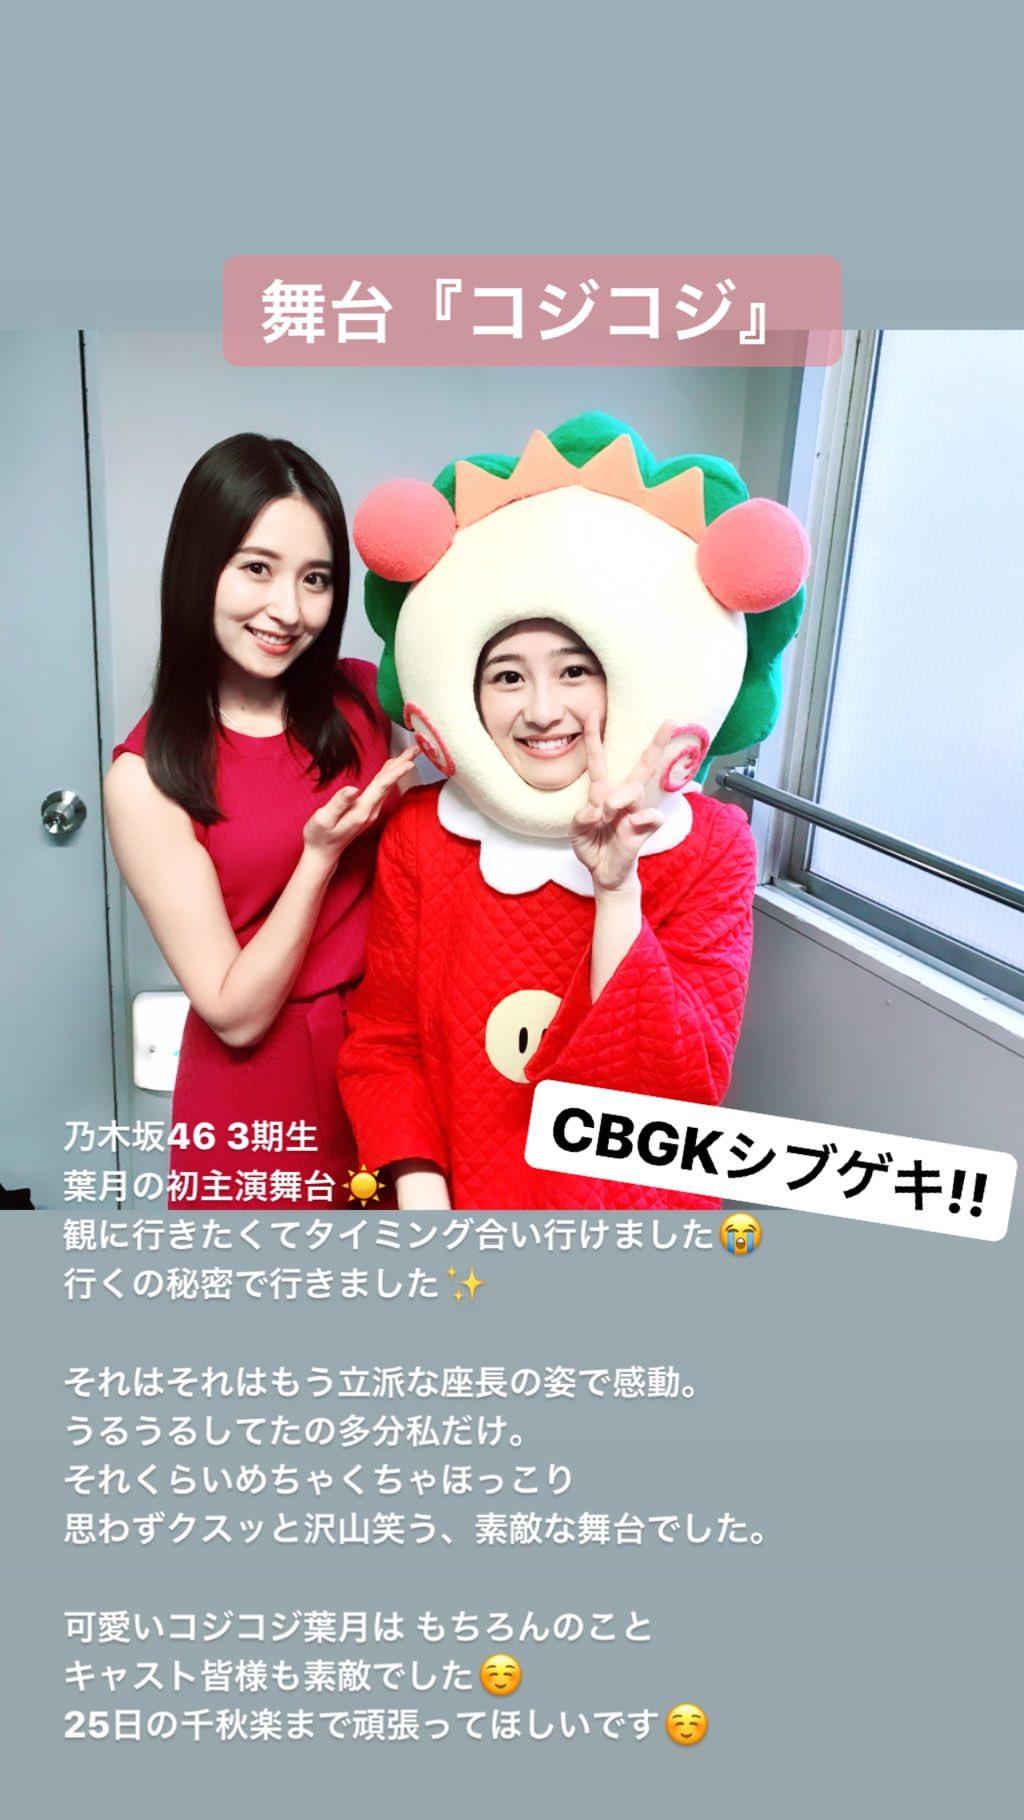 舞台「コジコジ」 衛藤美彩 向井葉月